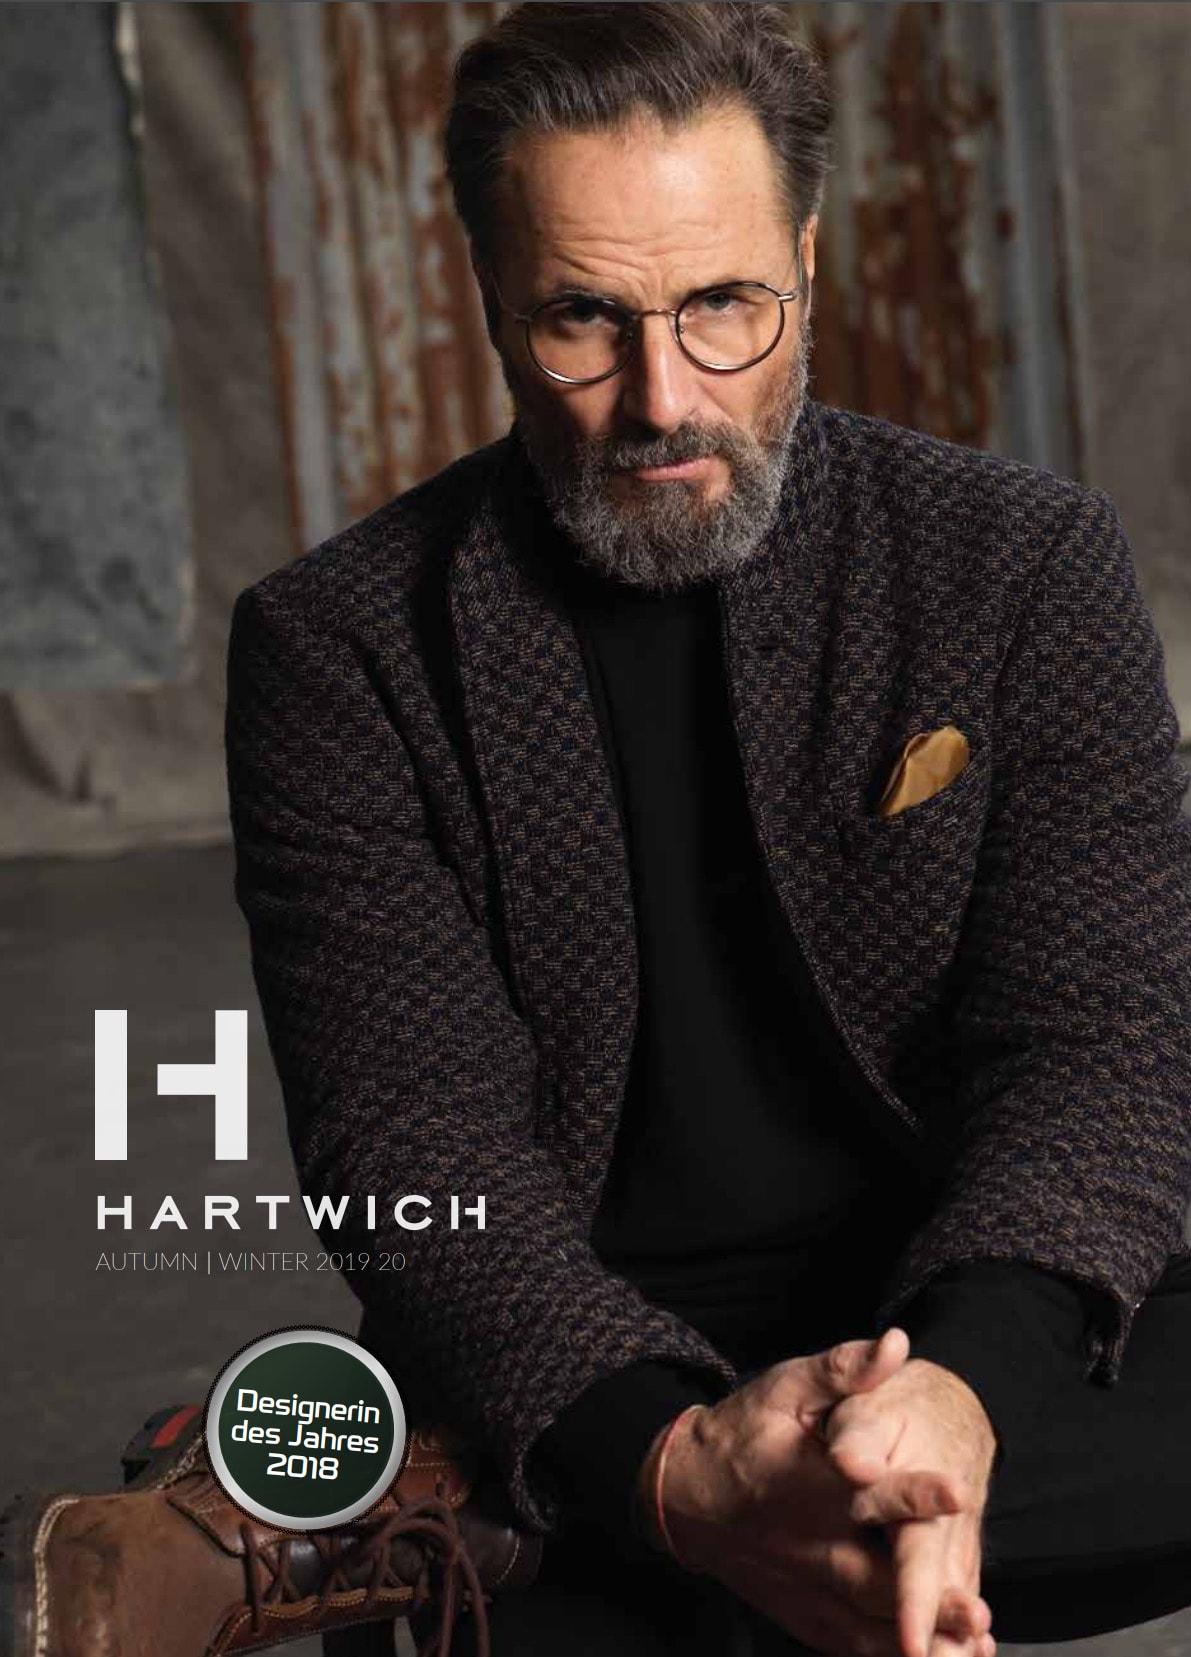 Hartwich Katalog AUTUMN|WINTER 2019 20